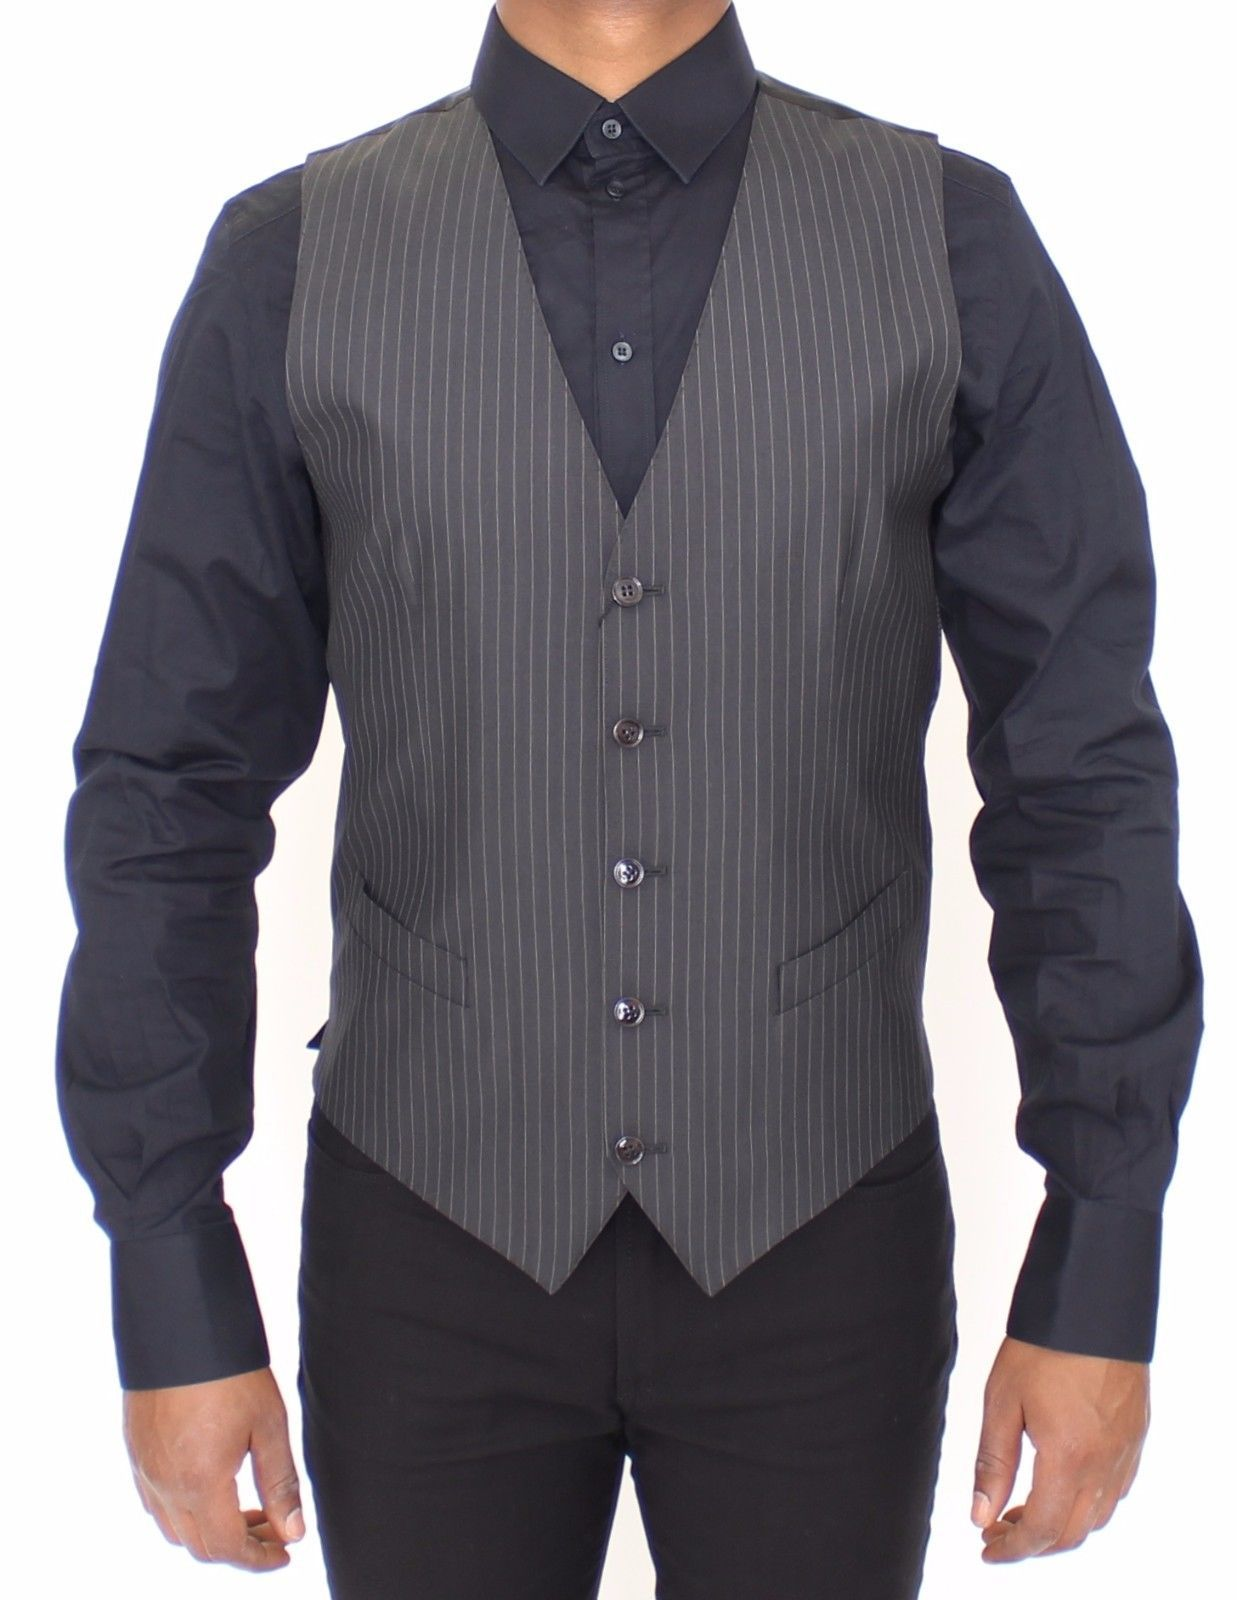 Dolce & Gabbana Gray Striped Wool Silk Dress Vest Gilet